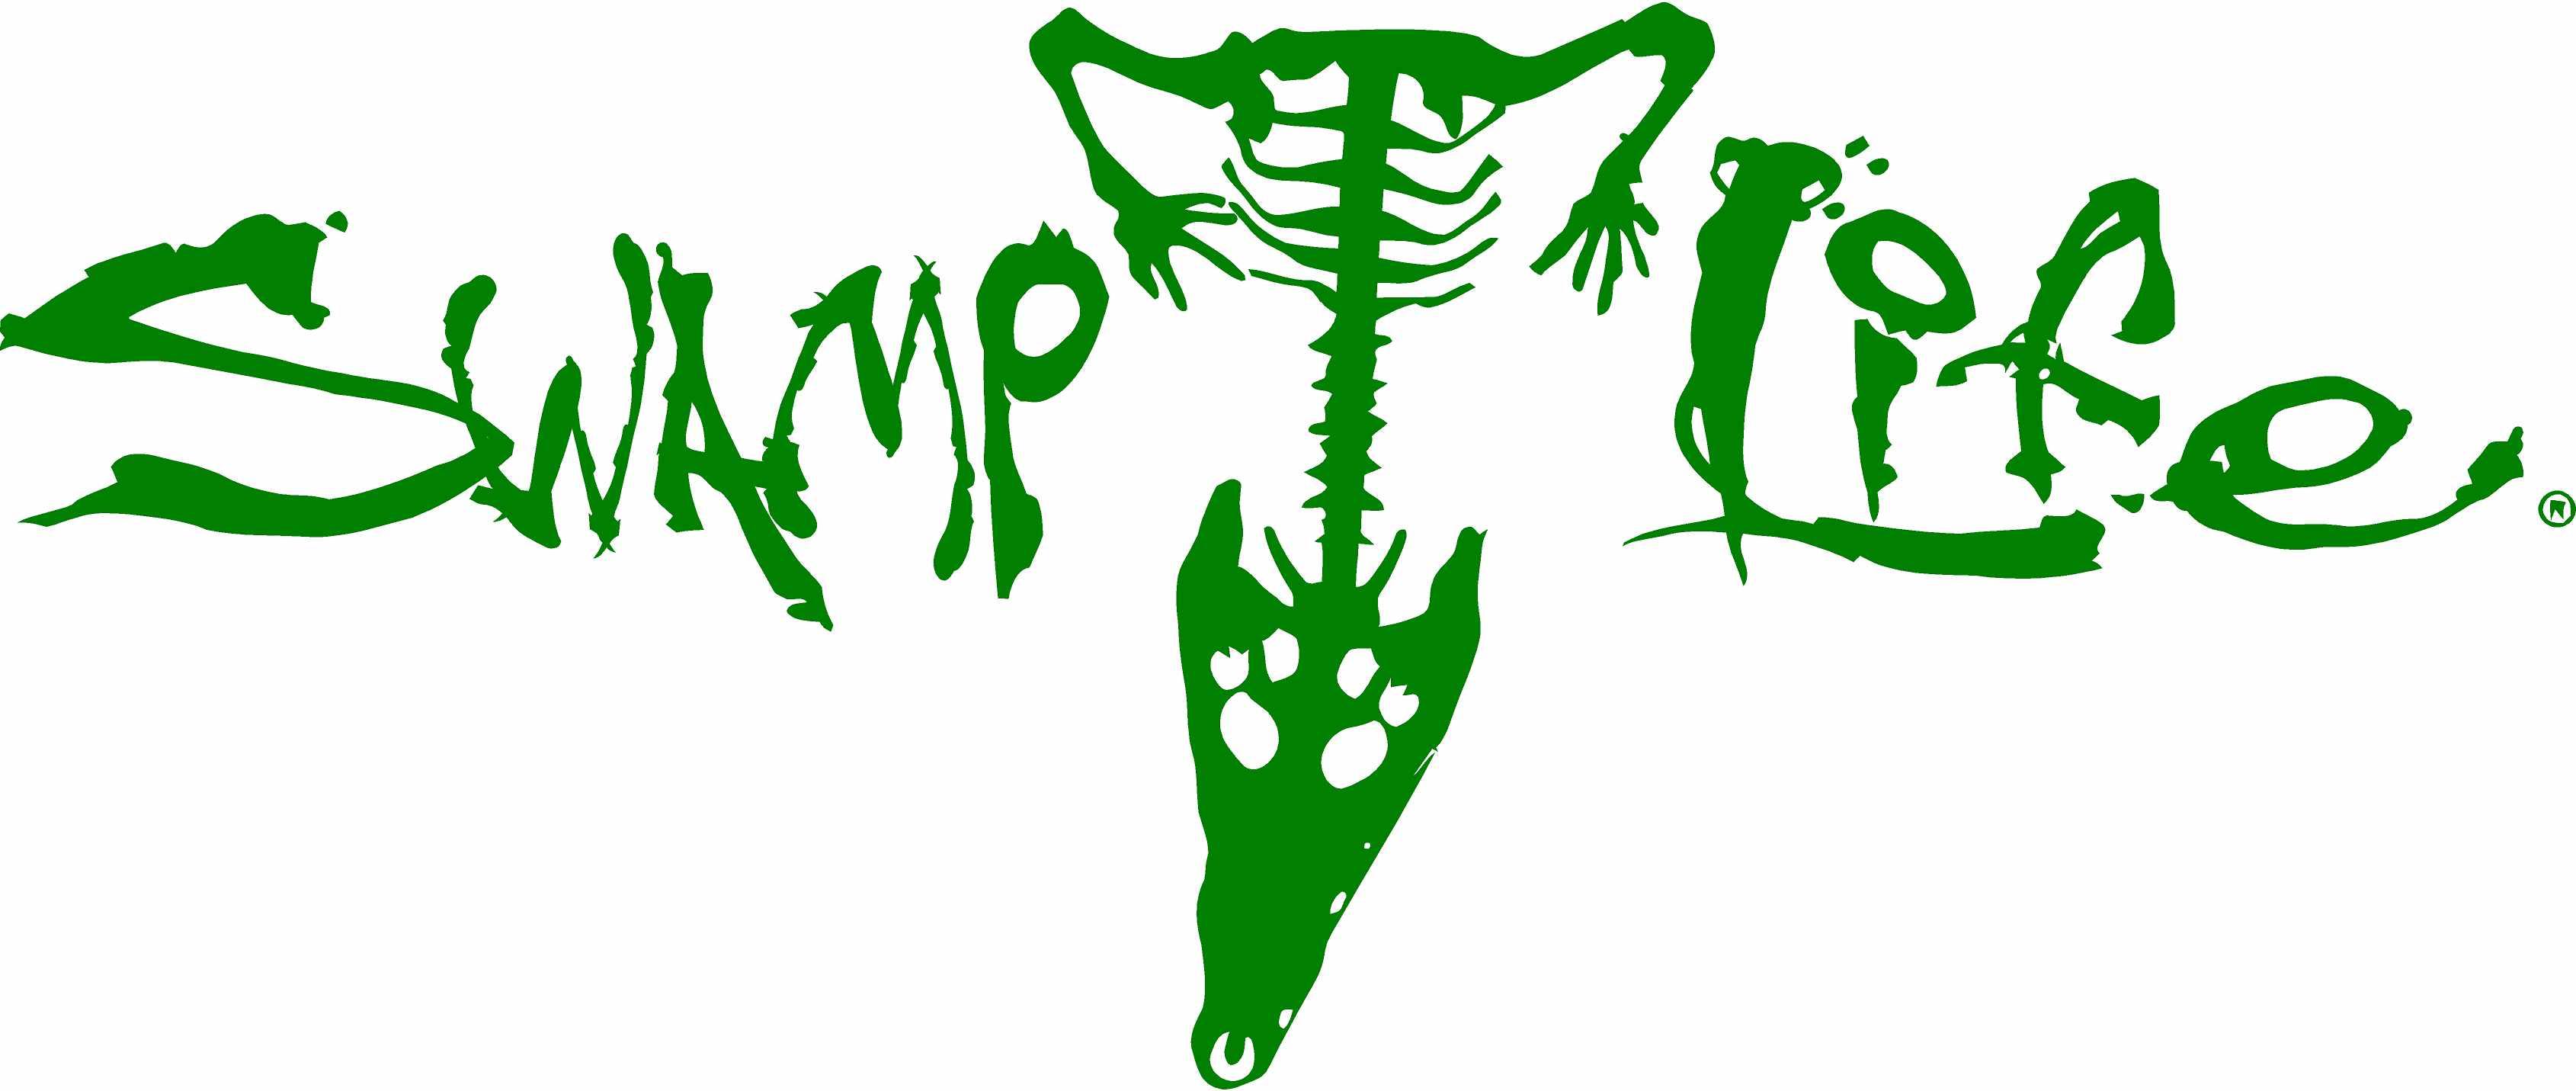 Swamp Life Gator Skeleton Decal 18 Quot On Storenvy